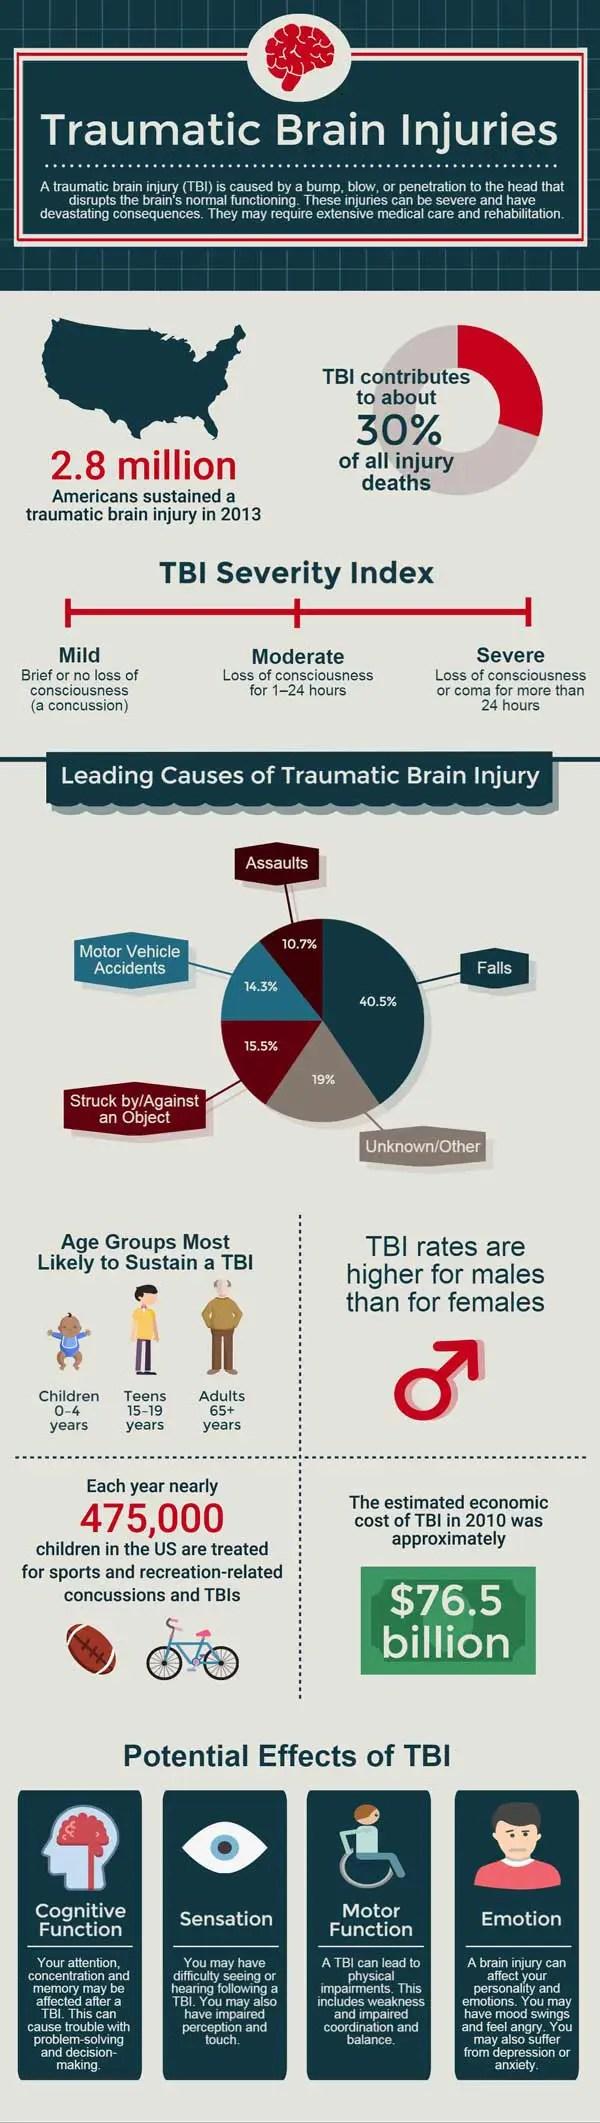 /Infographic-Traumatic-Brain-Injuries